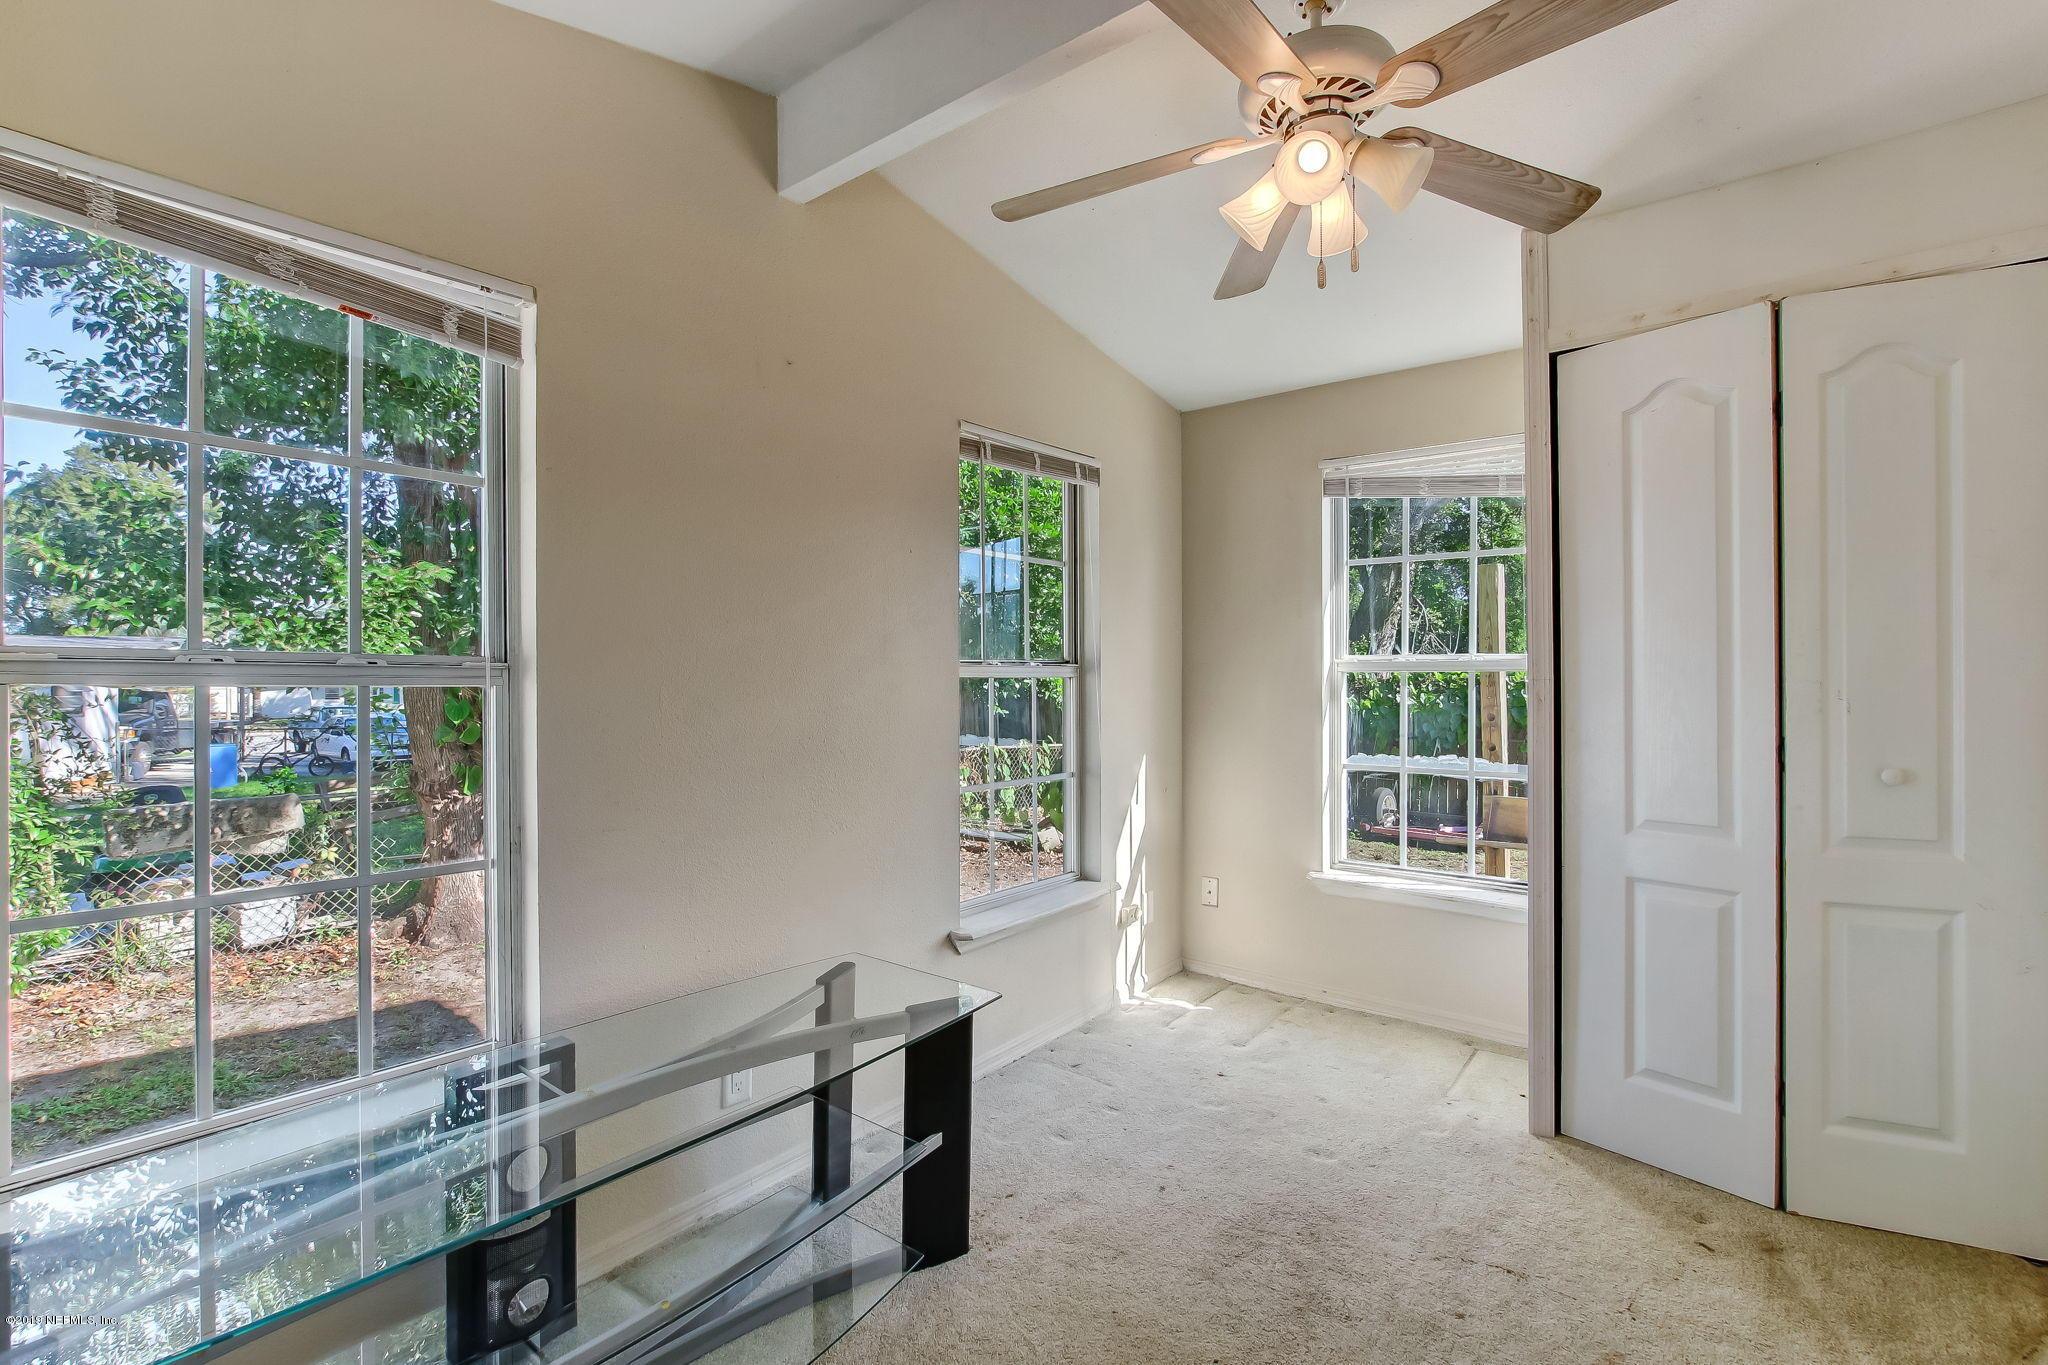 413 JANELL, ORANGE PARK, FLORIDA 32073, 3 Bedrooms Bedrooms, ,4 BathroomsBathrooms,Residential,For sale,JANELL,1026236